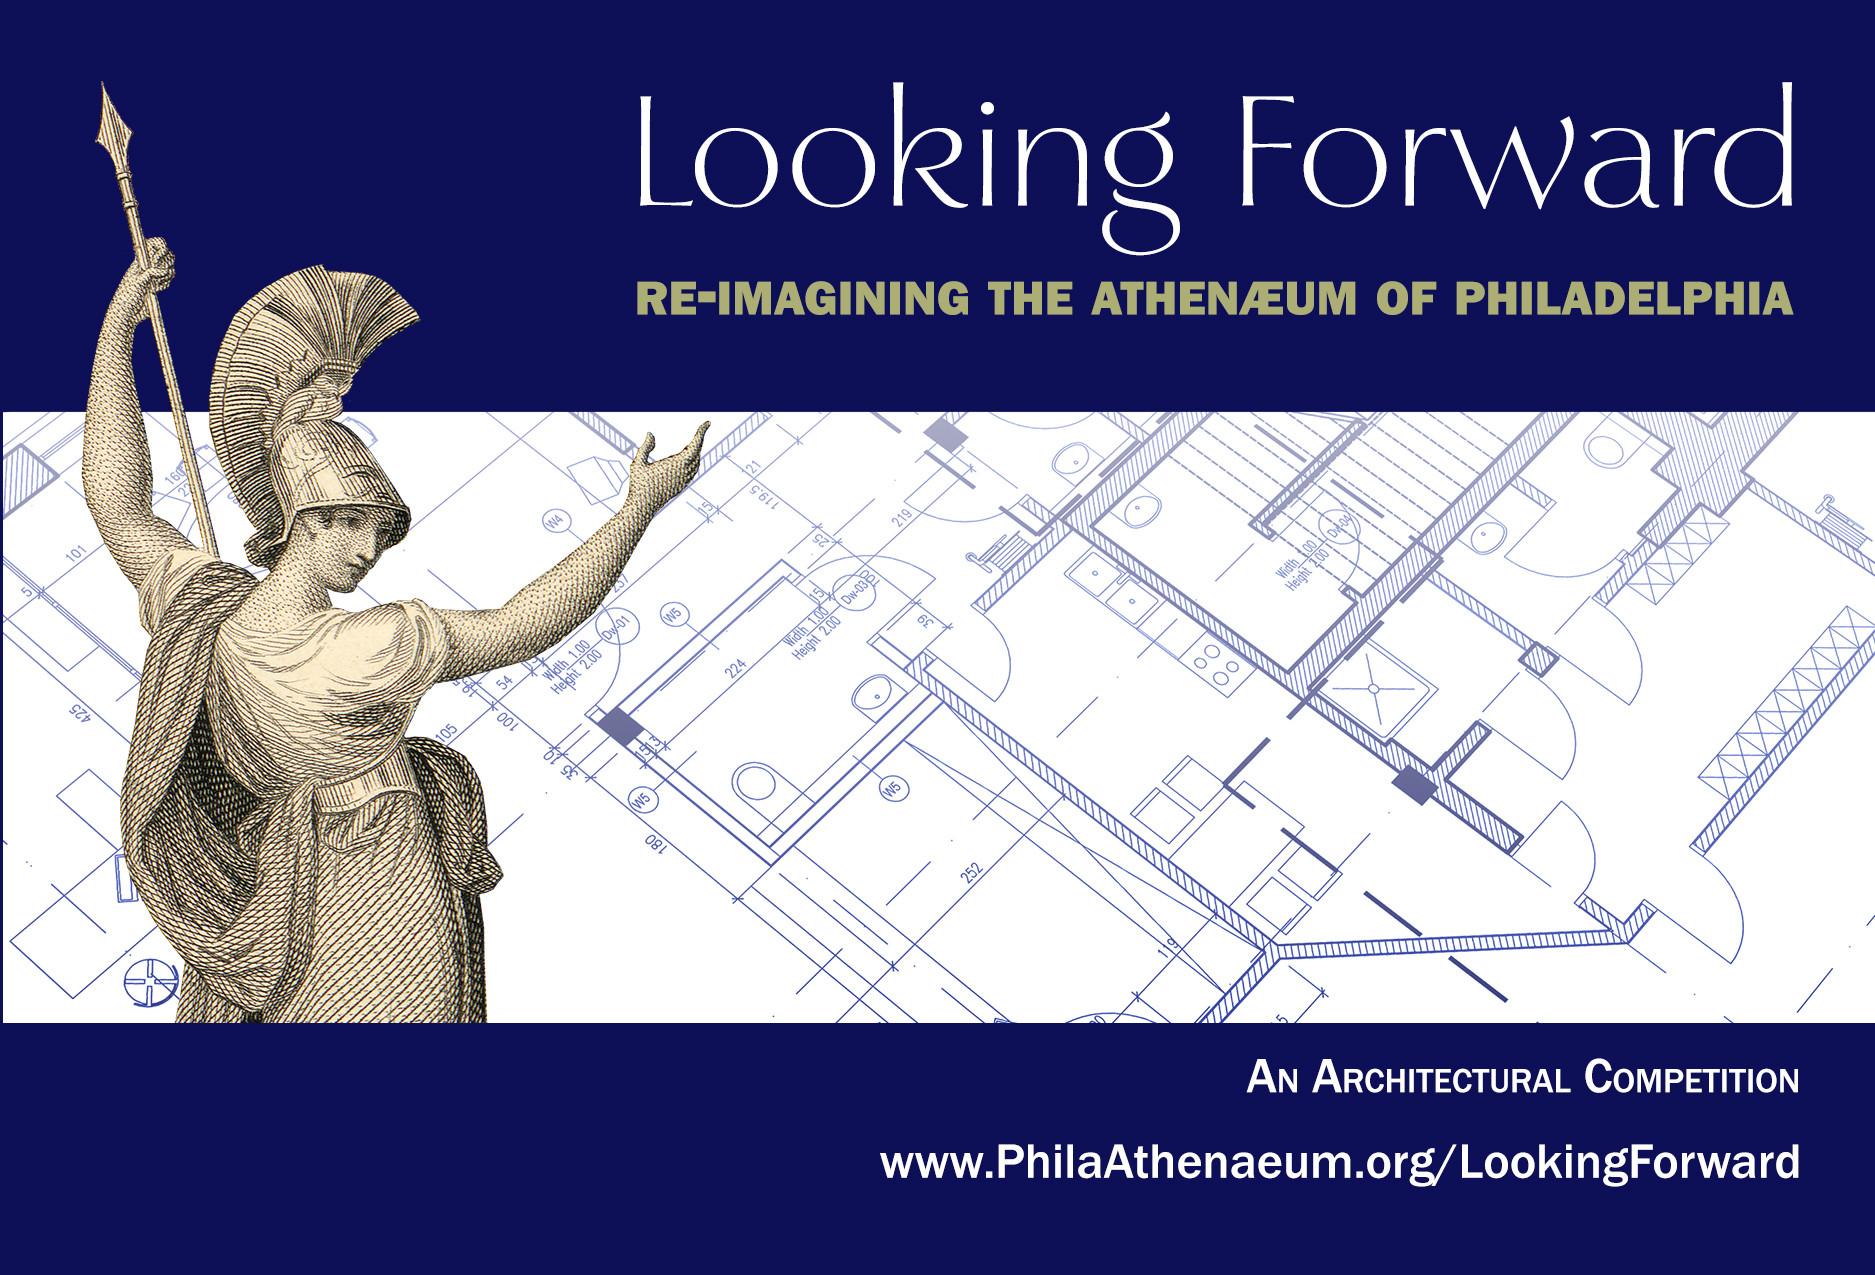 Competition: Re-Imagining The Athenaeum of Philadelphia